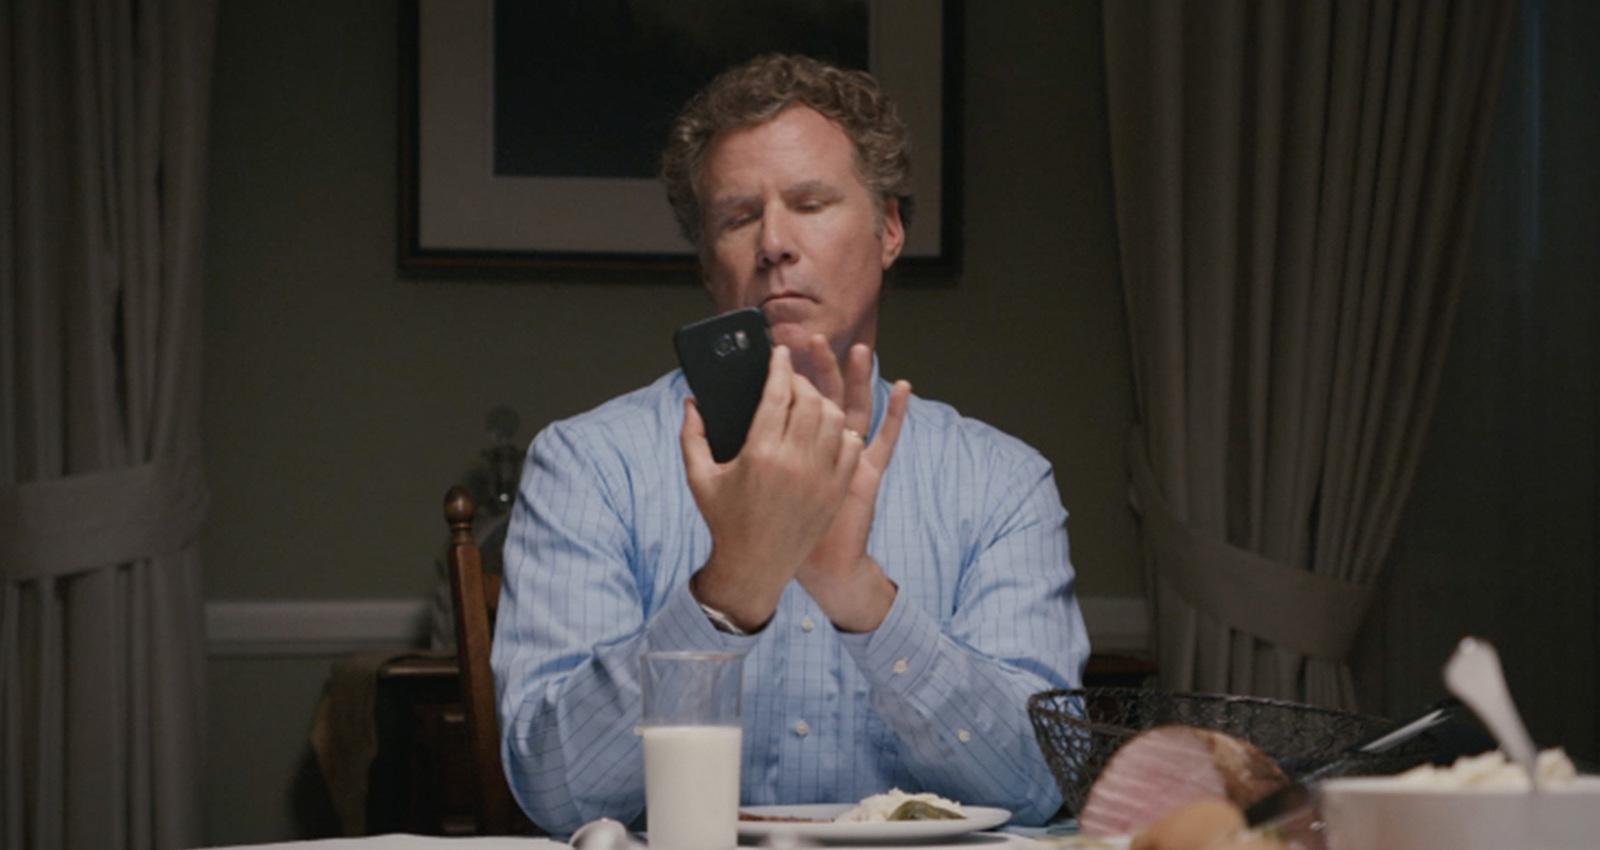 Device Free Dinner on Funny or Die